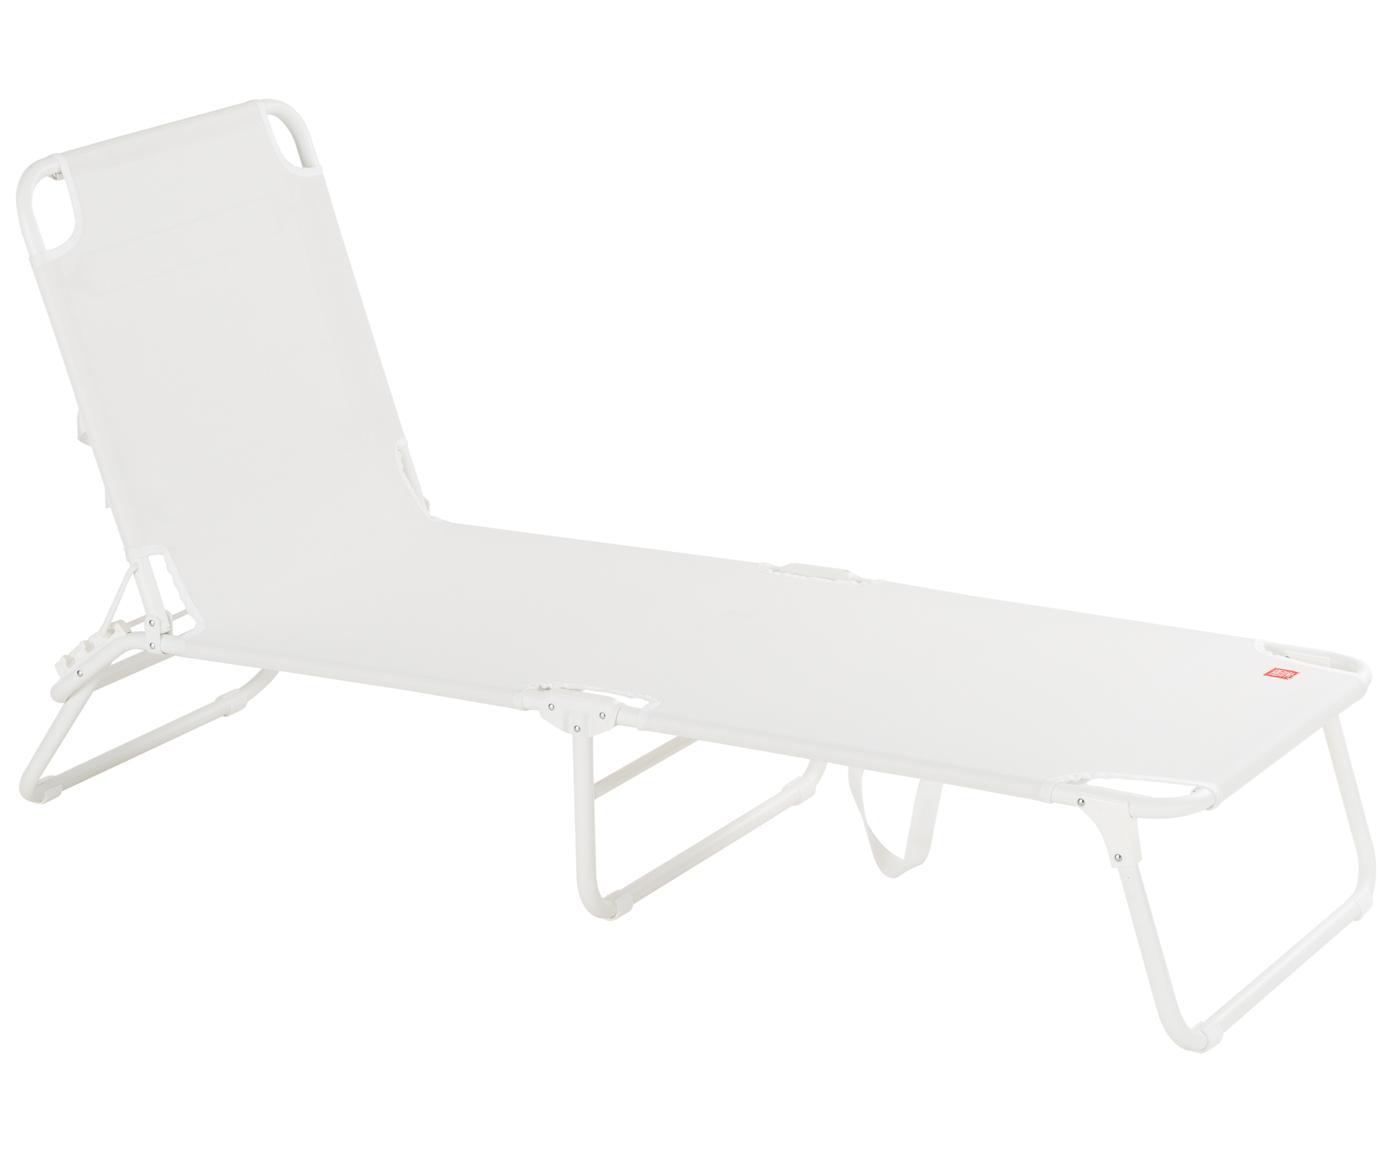 Ligstoel Fiam Amigo, Frame: aluminium, Bekleding: polyester, Wit, B 190  x D 58 cm